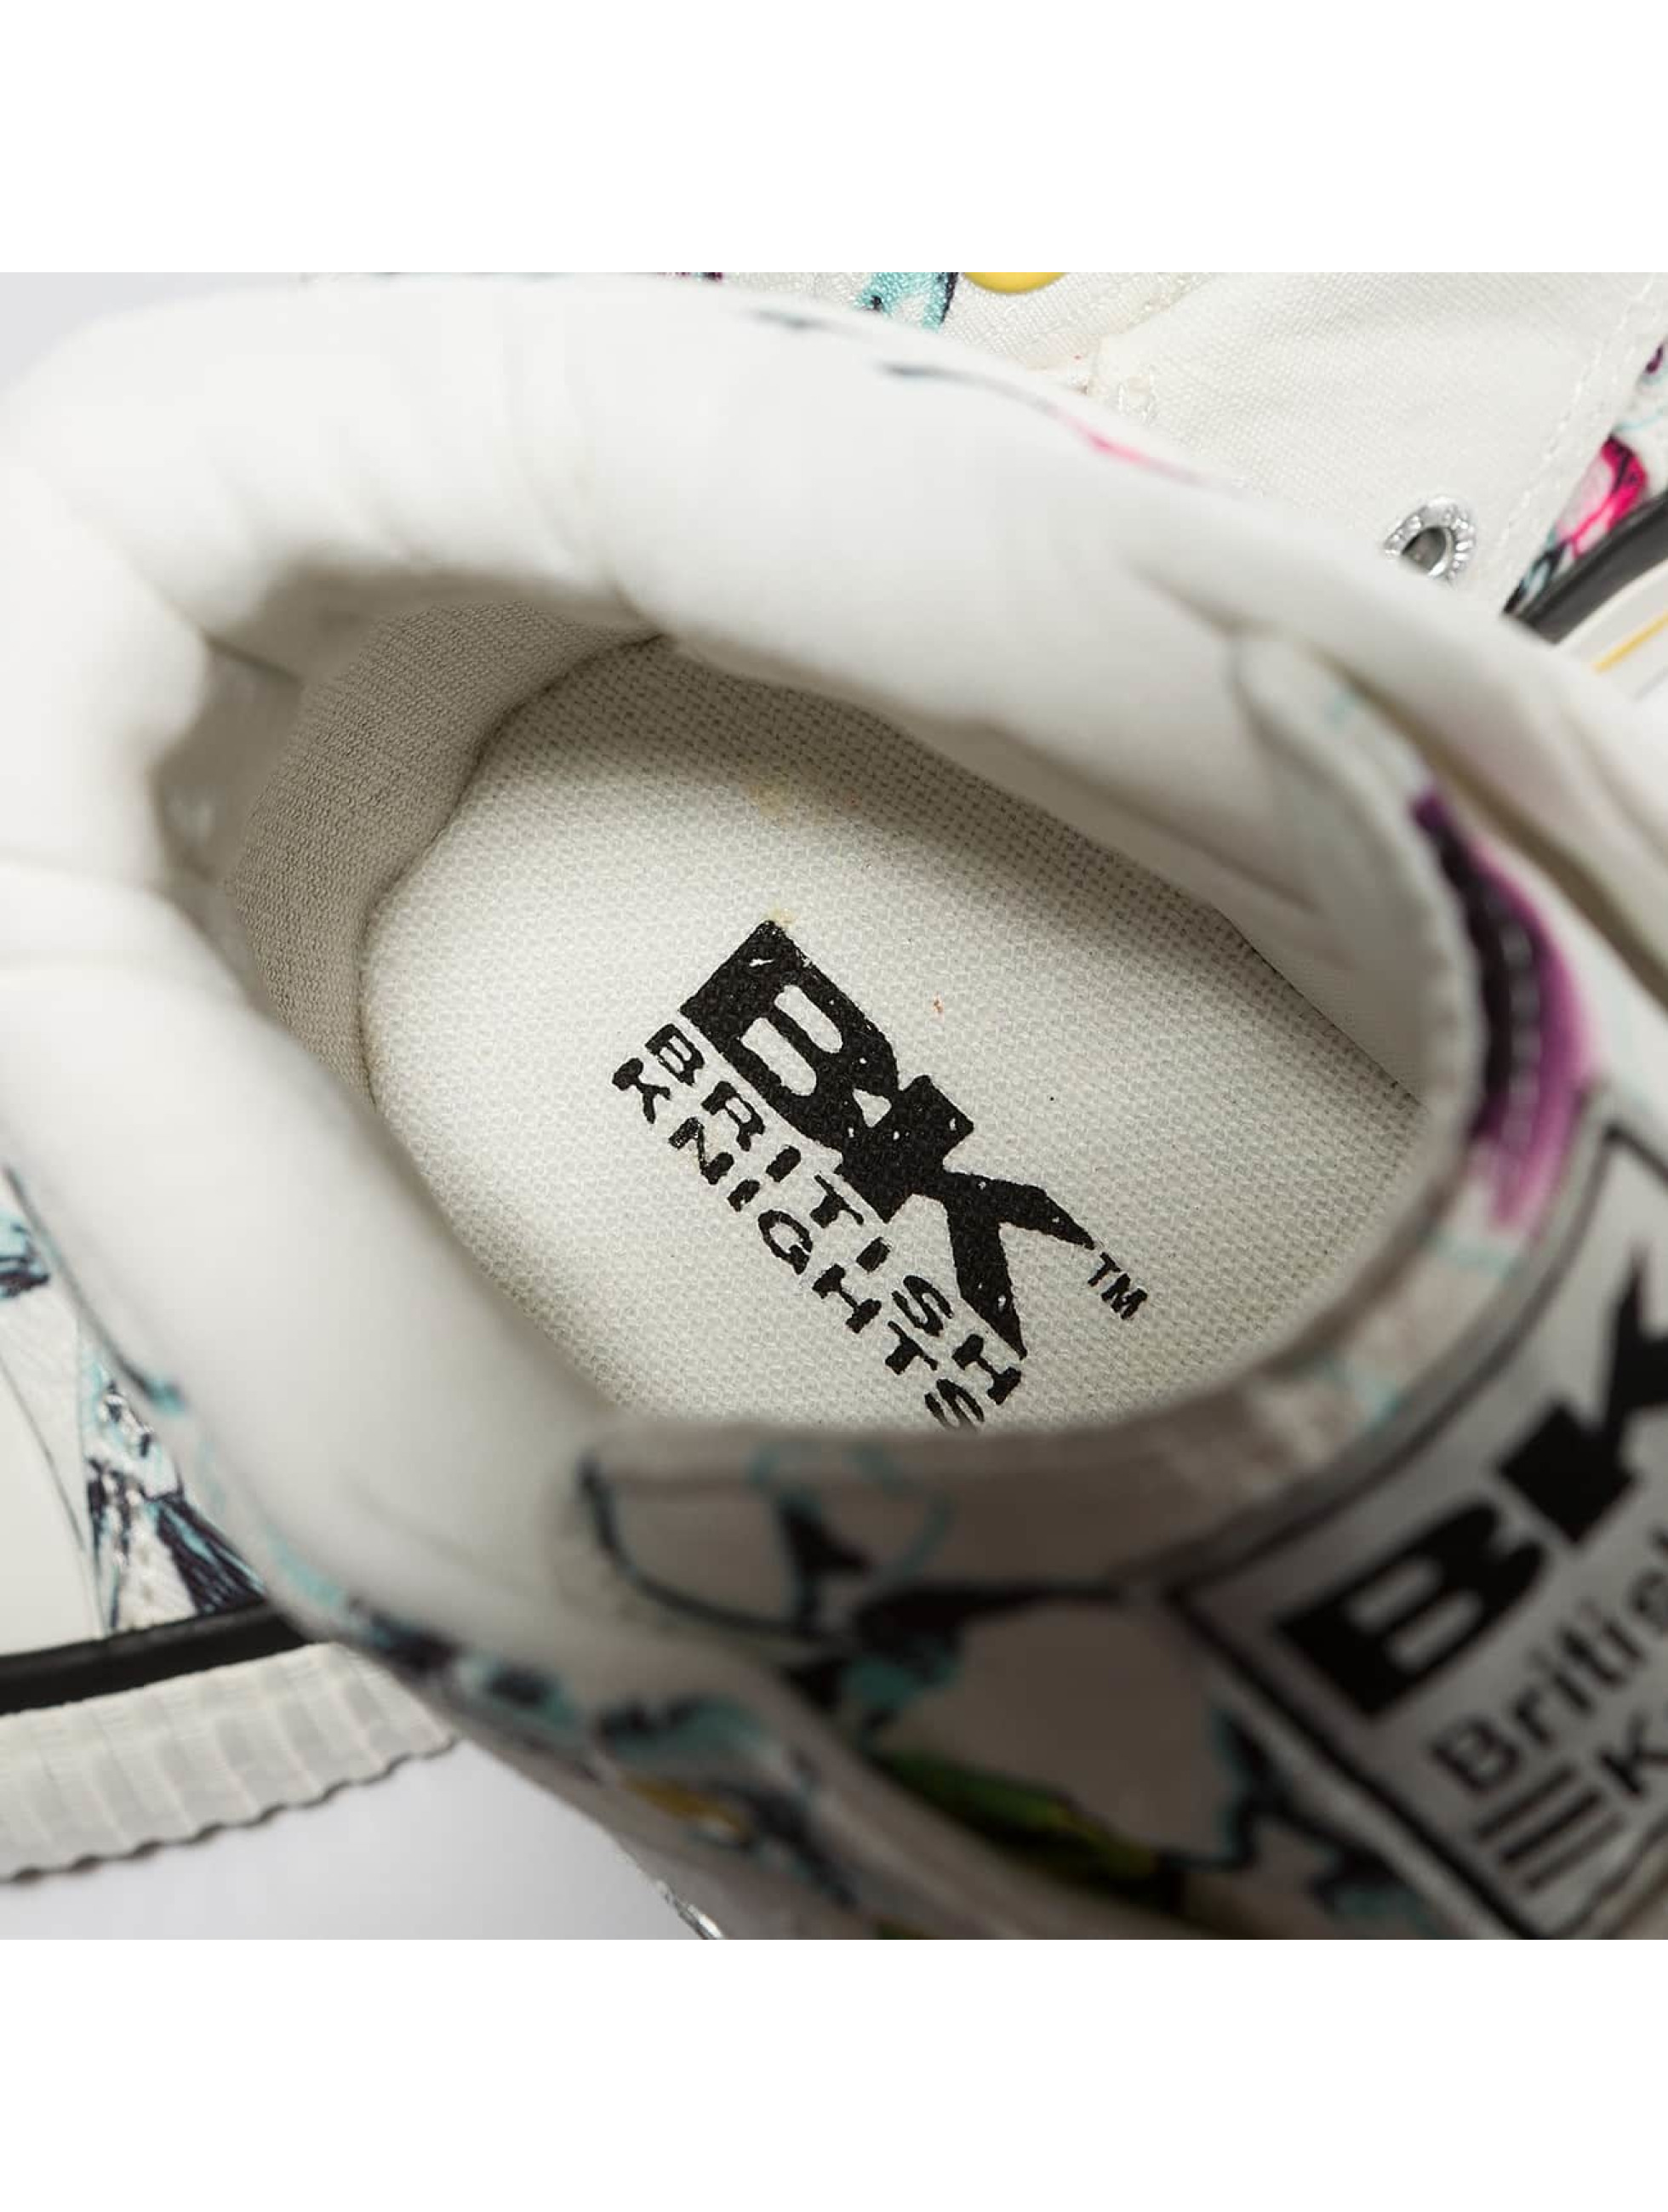 British Knights Sneakers Roco colored